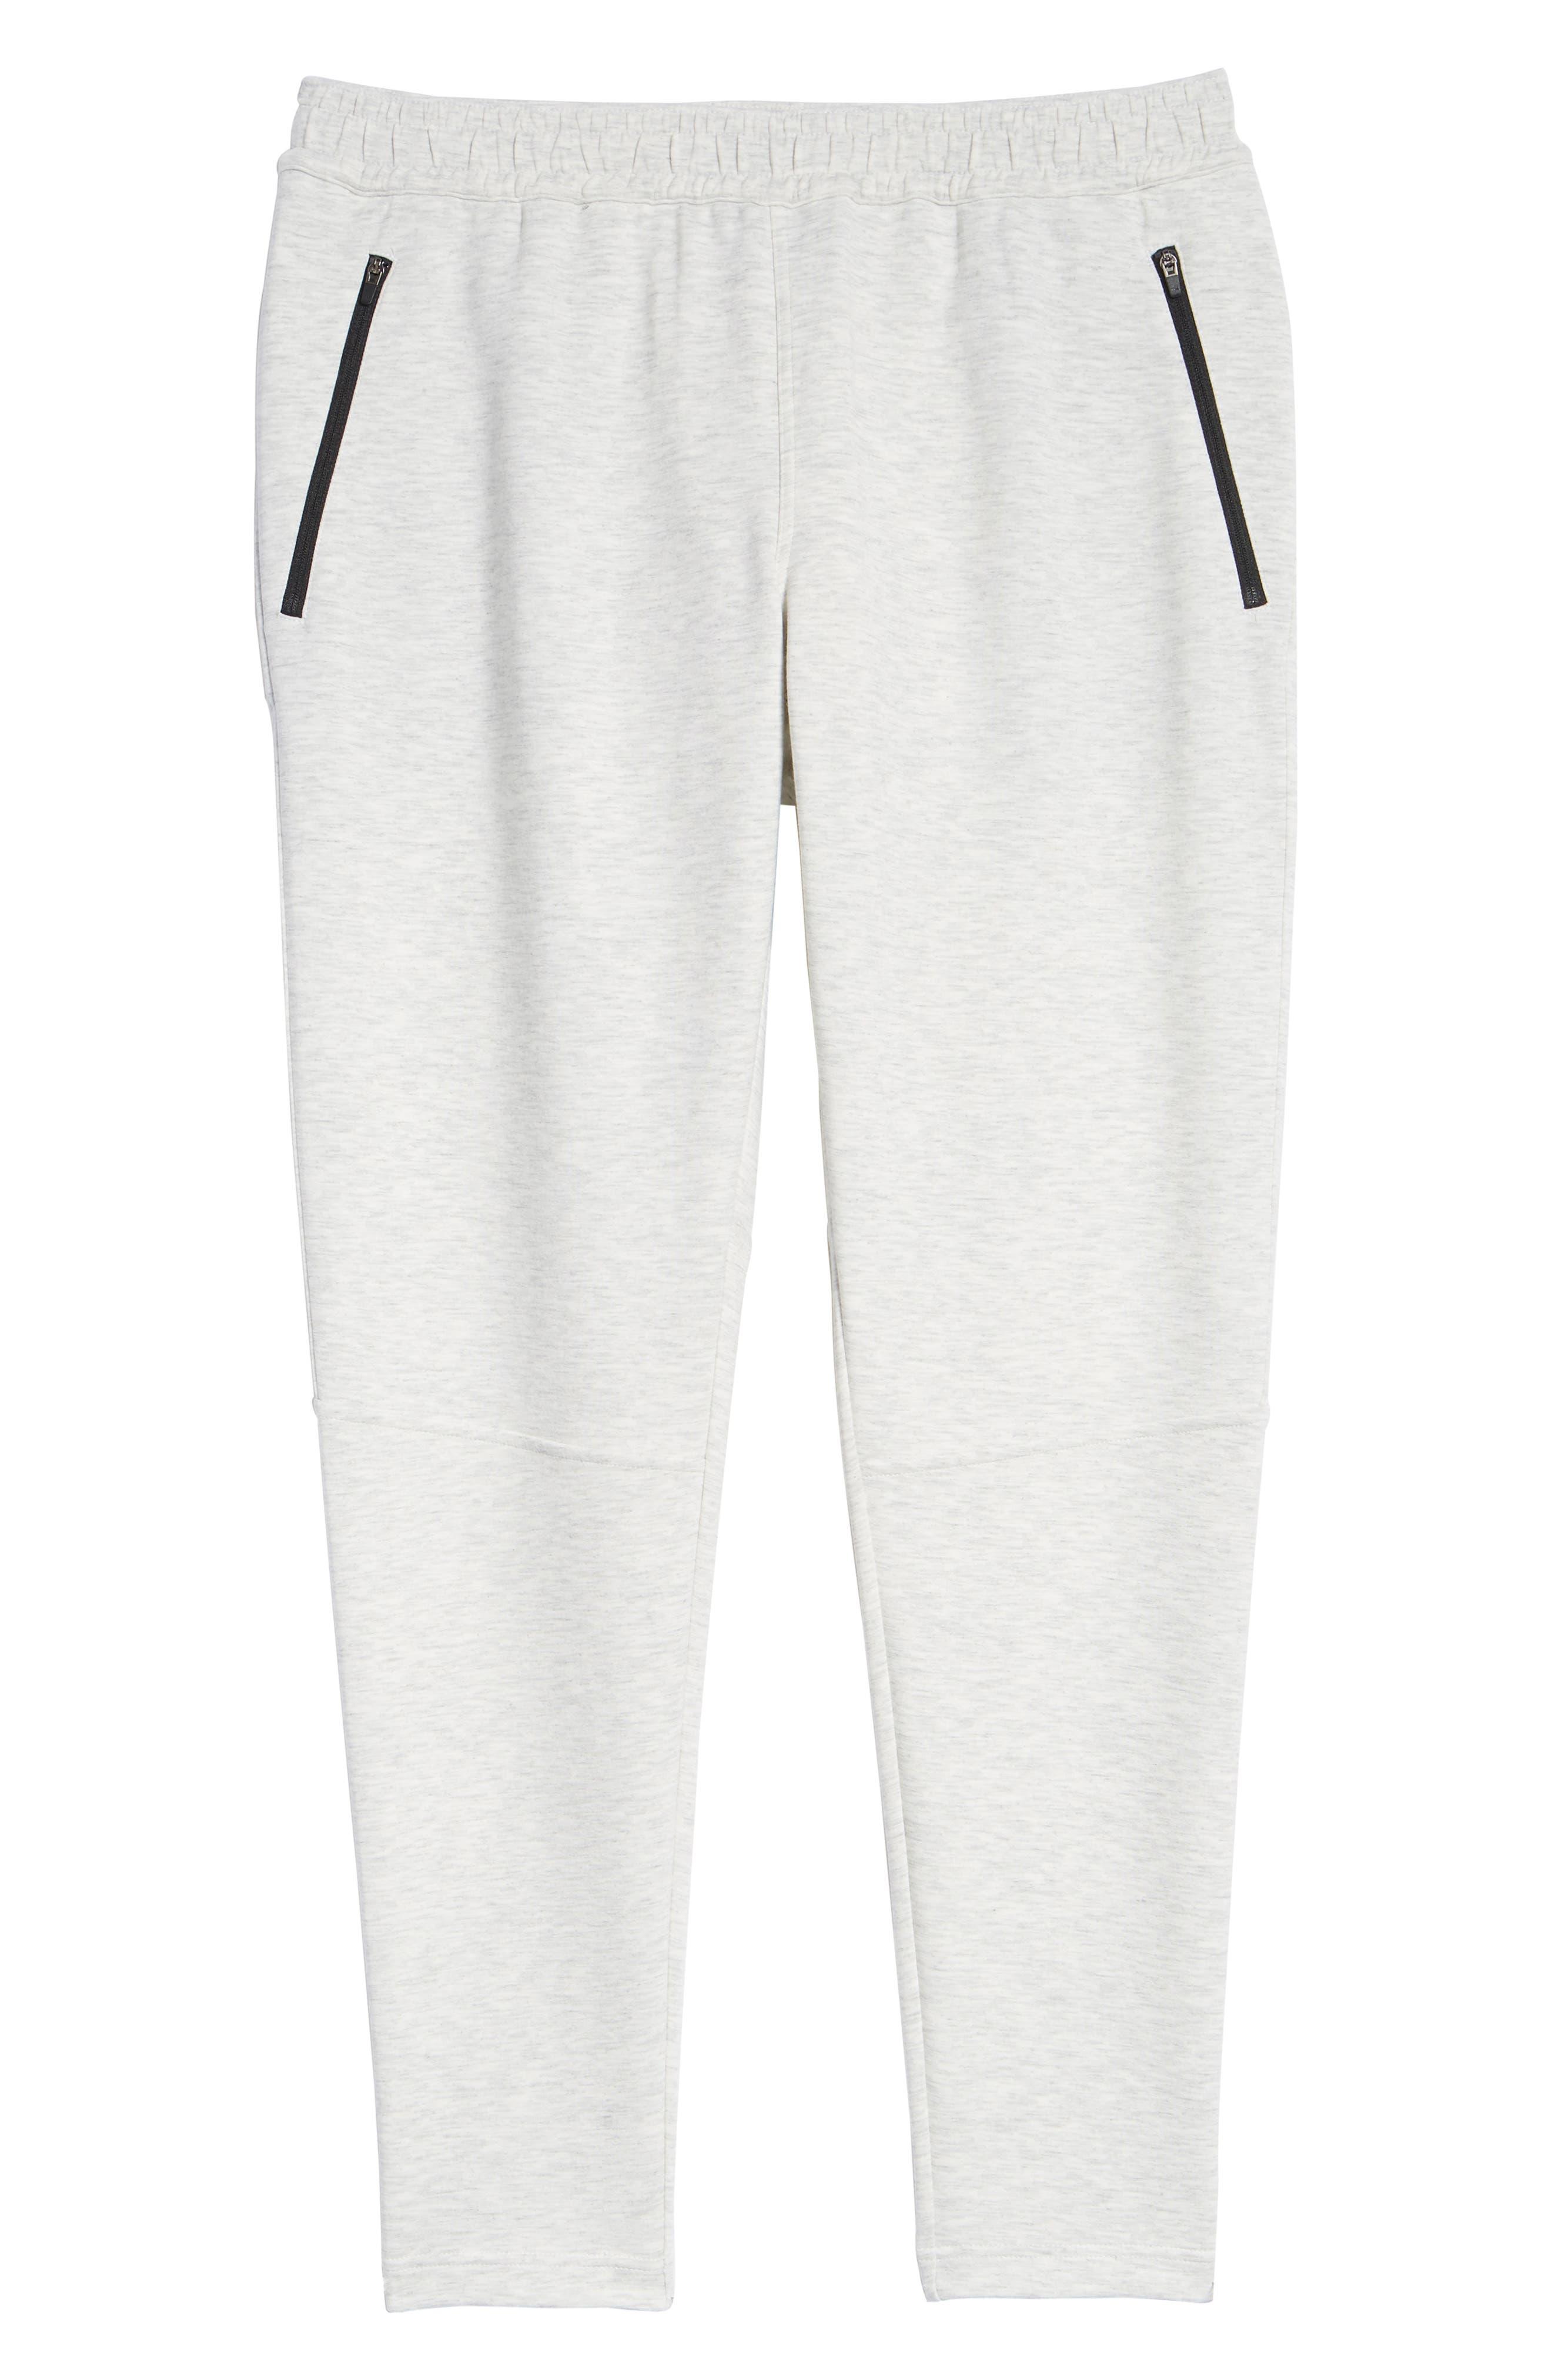 ZELLA, Zip Pocket Tech Jogger Pants, Alternate thumbnail 7, color, WHITE OXIDE MELANGE